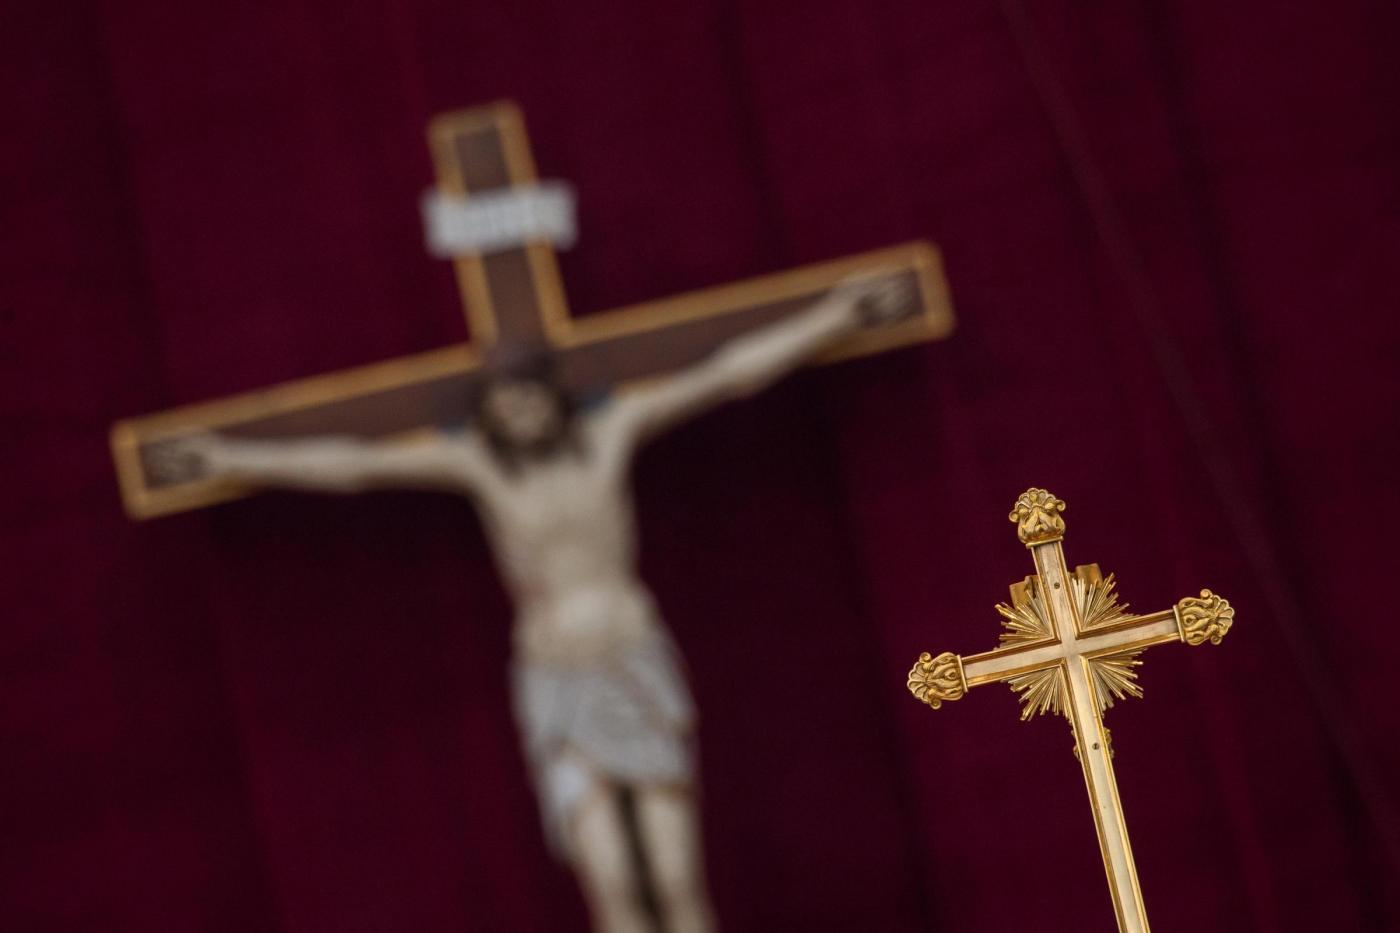 Giubileo: sequestrati 500 mila pezzi tra rosari e altri gadget falsi